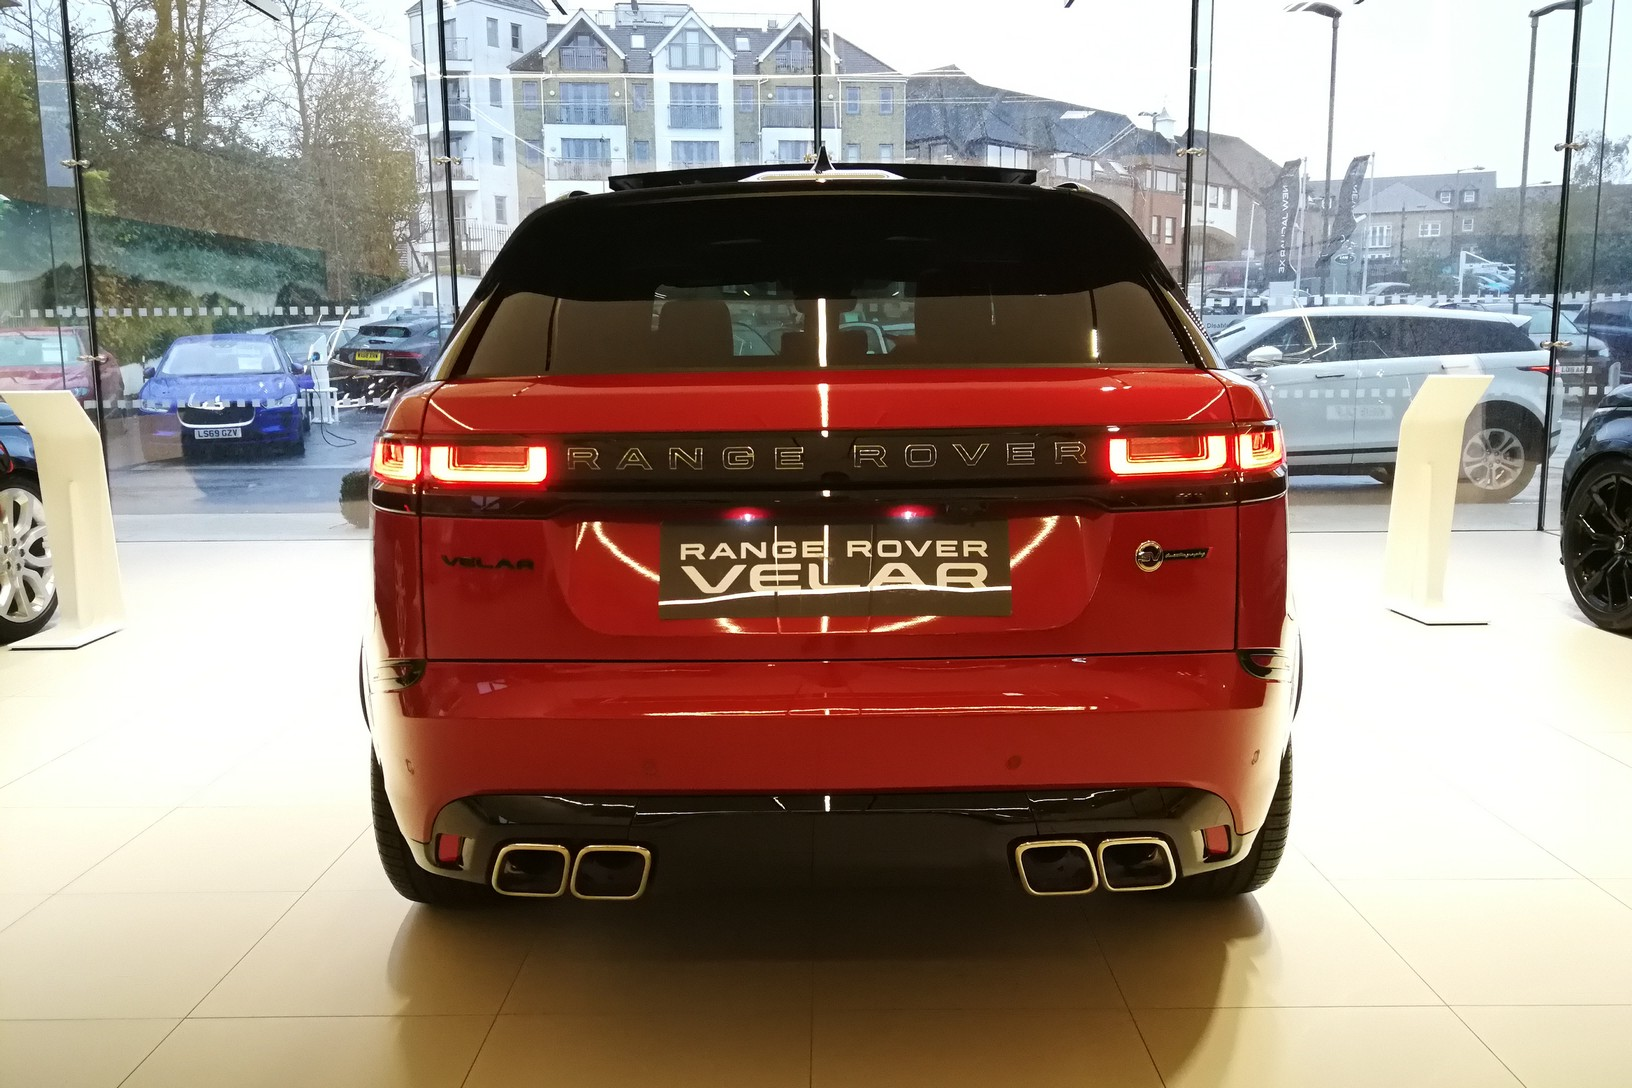 Land Rover Range Rover Velar 5.0 P550 SVAutobiography Dynamic Edition 5dr Auto image 5